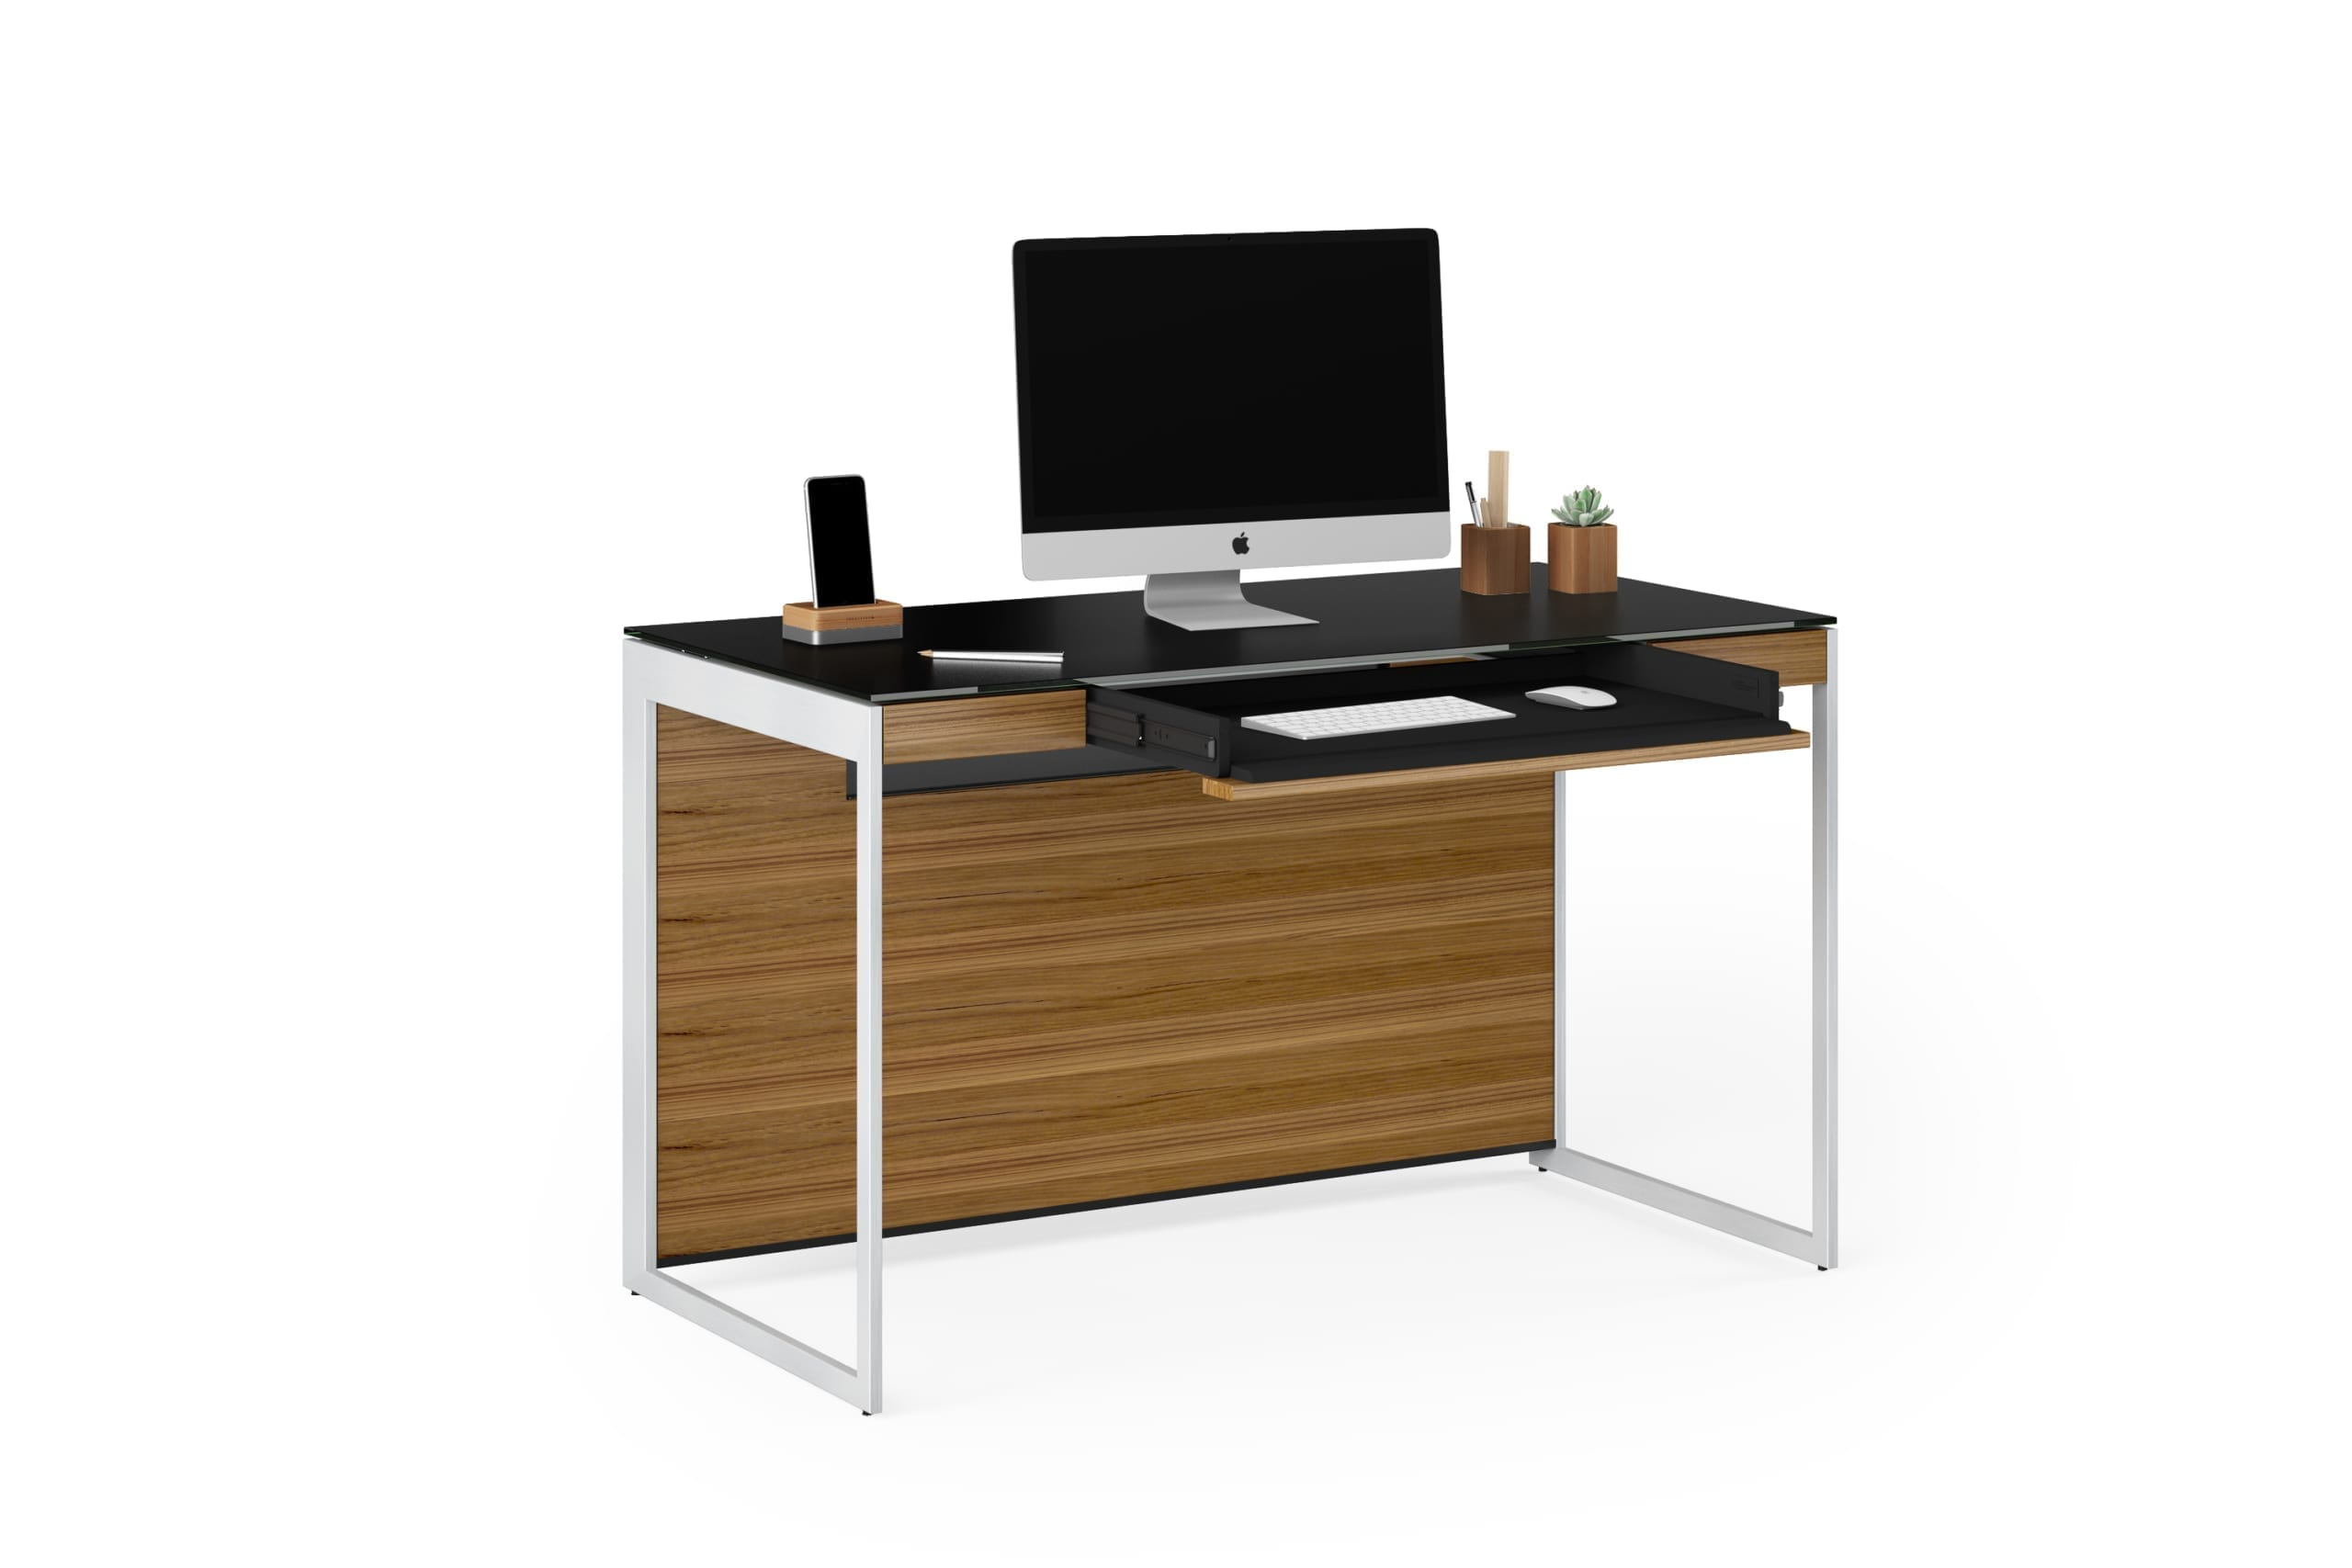 Sequel 6103 Desk Natural Walnut / Satin Nickel